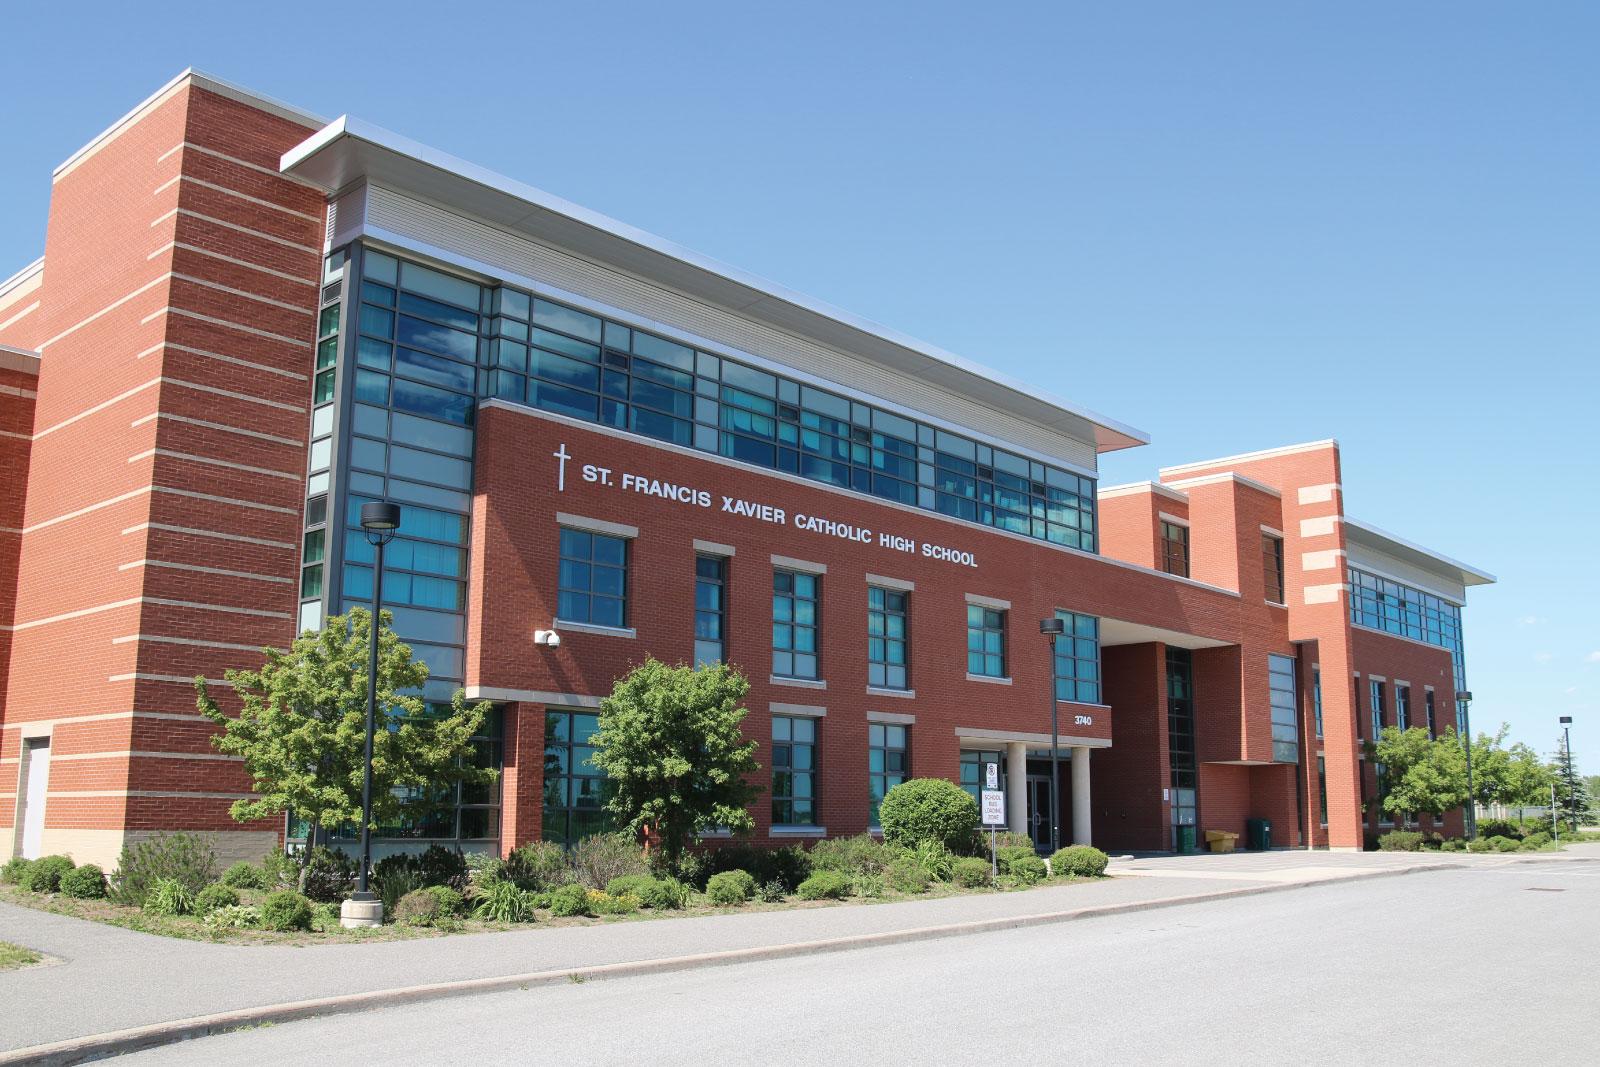 St. Francis Xavier Catholic High School (Bang Wisconsin)